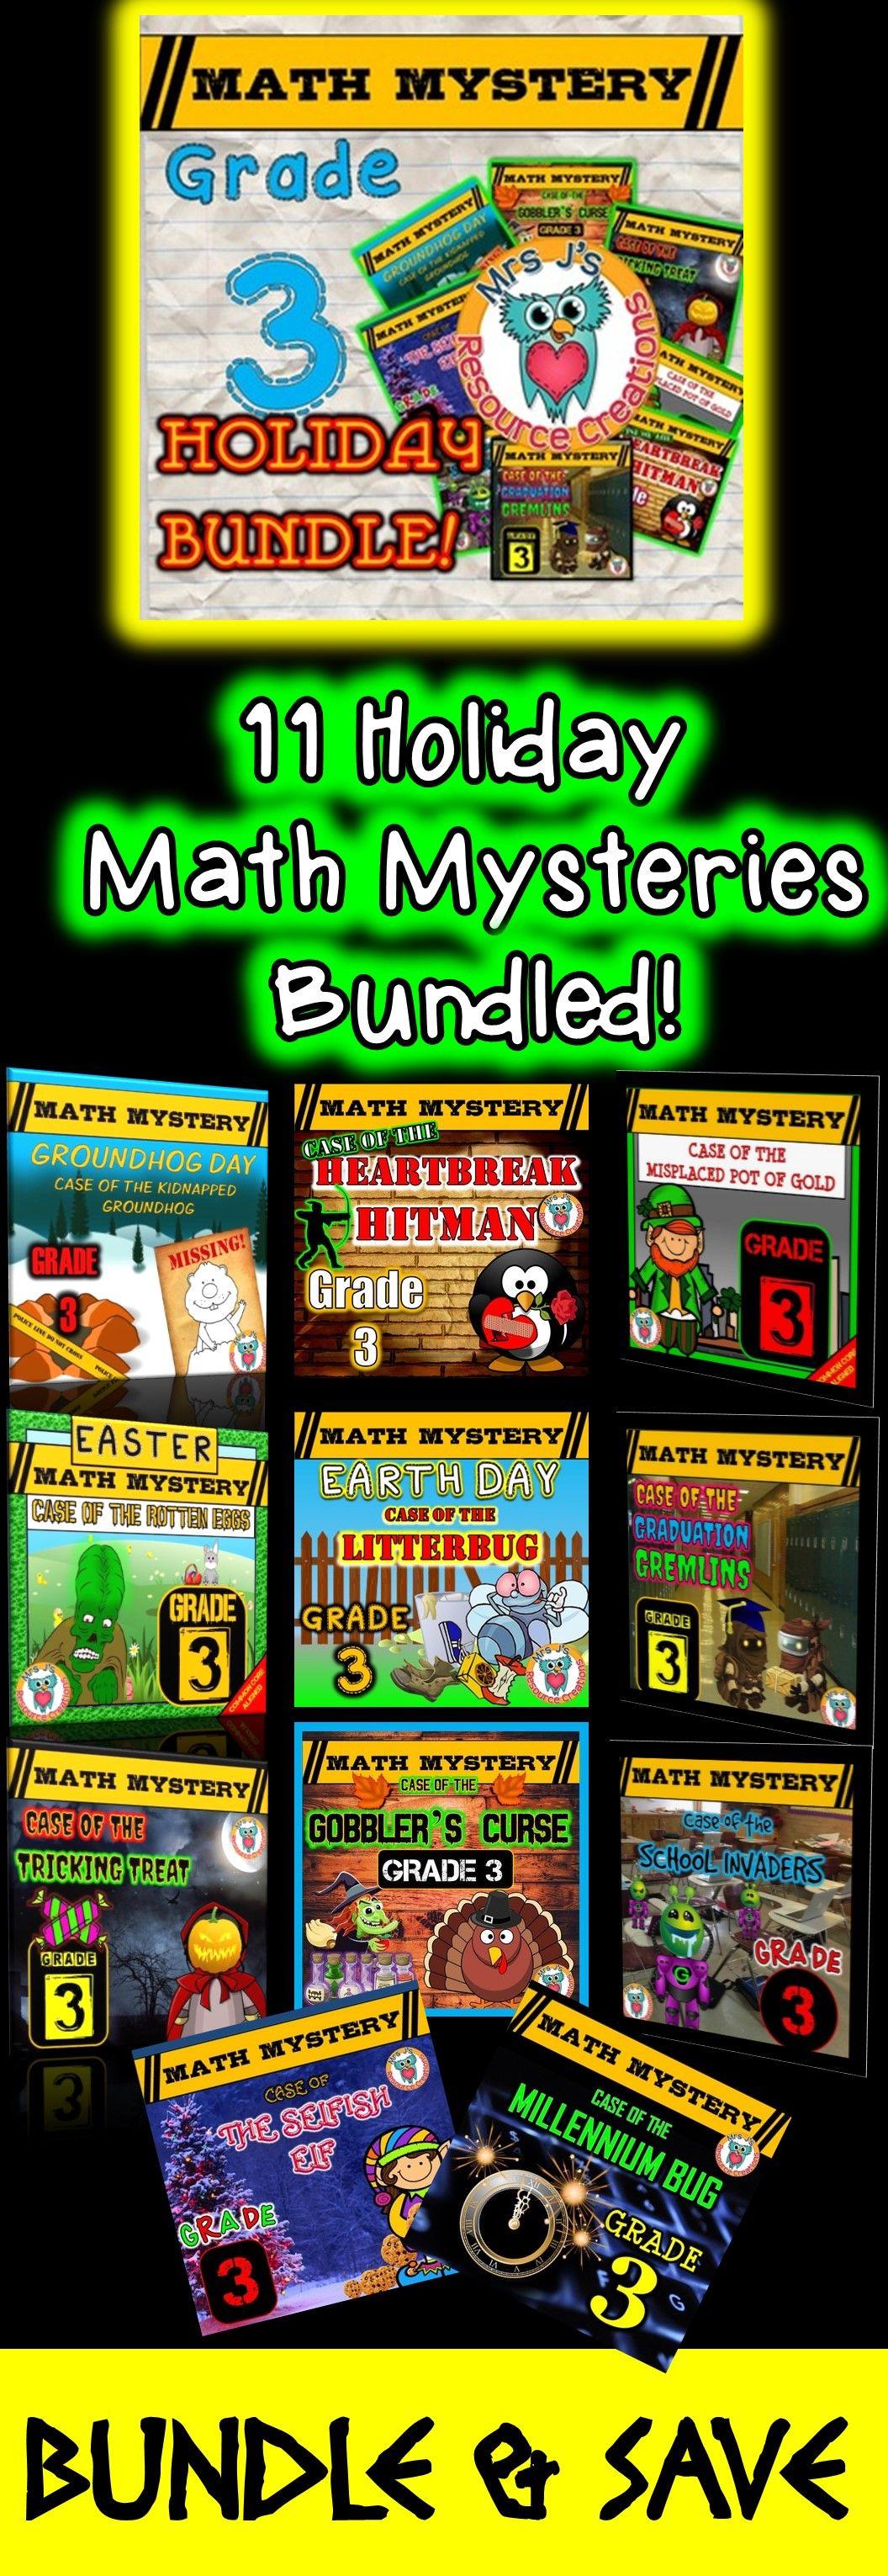 Math Mysteries Holiday Themed Bundled Grade 3 Fun Math